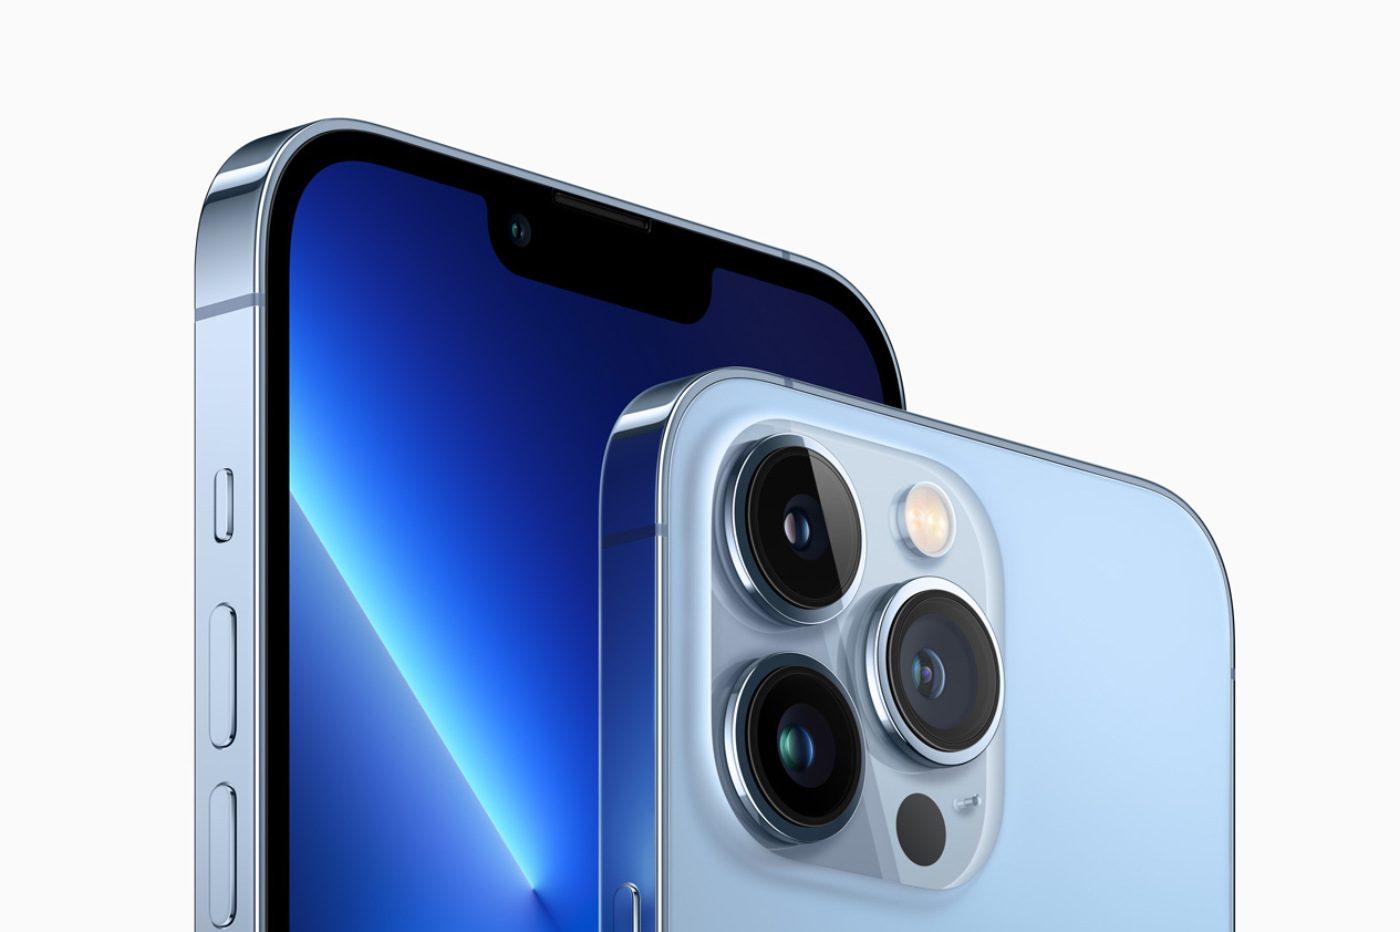 iPhone 13 Pro Apple 2021